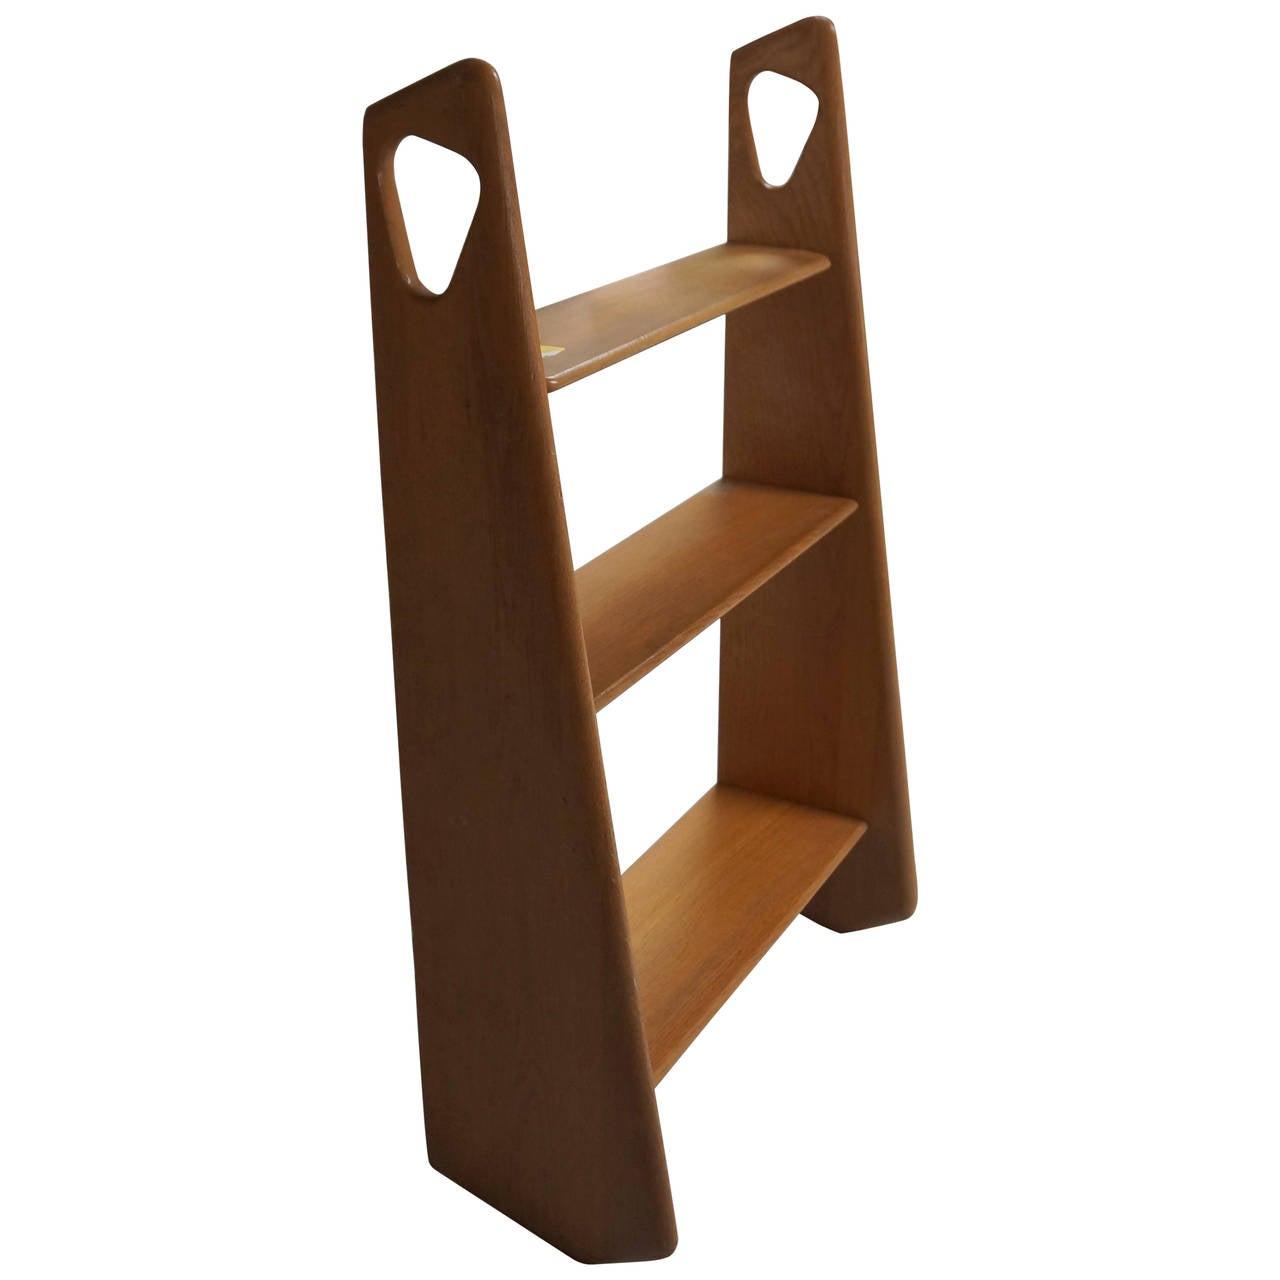 Hanging Shelf by Rene Gabriel